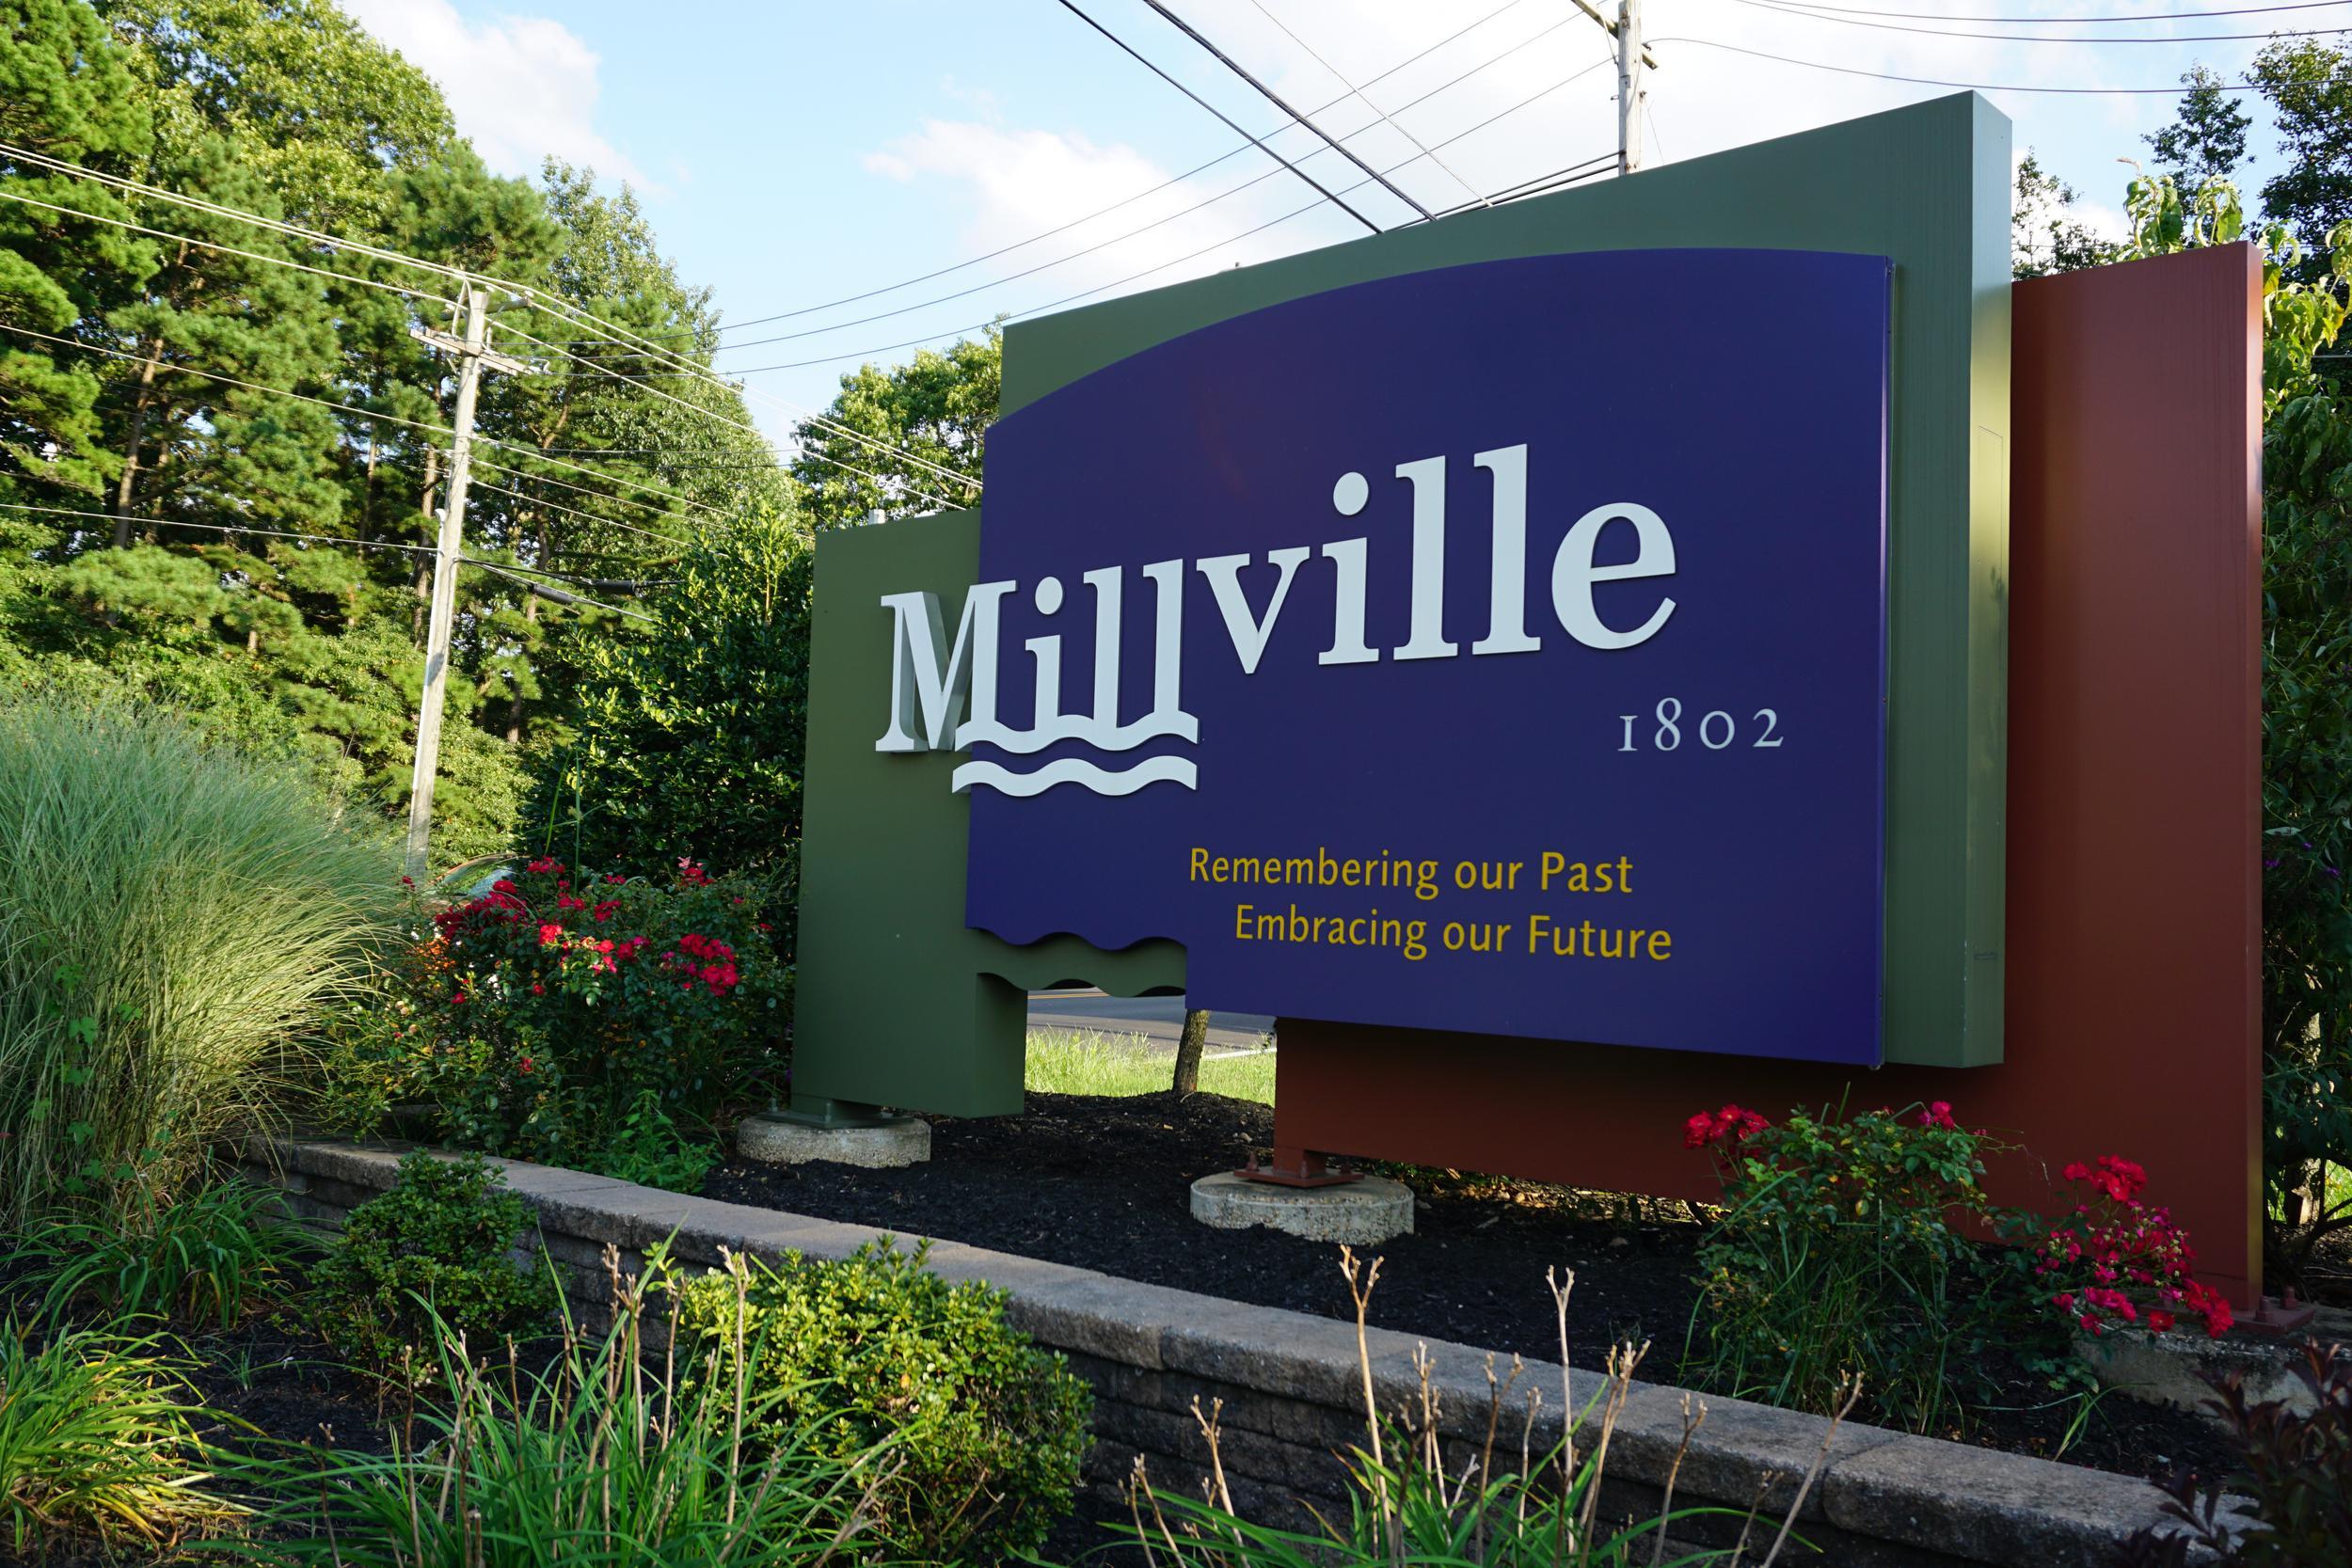 millville-new-jersey-down-town.jpg